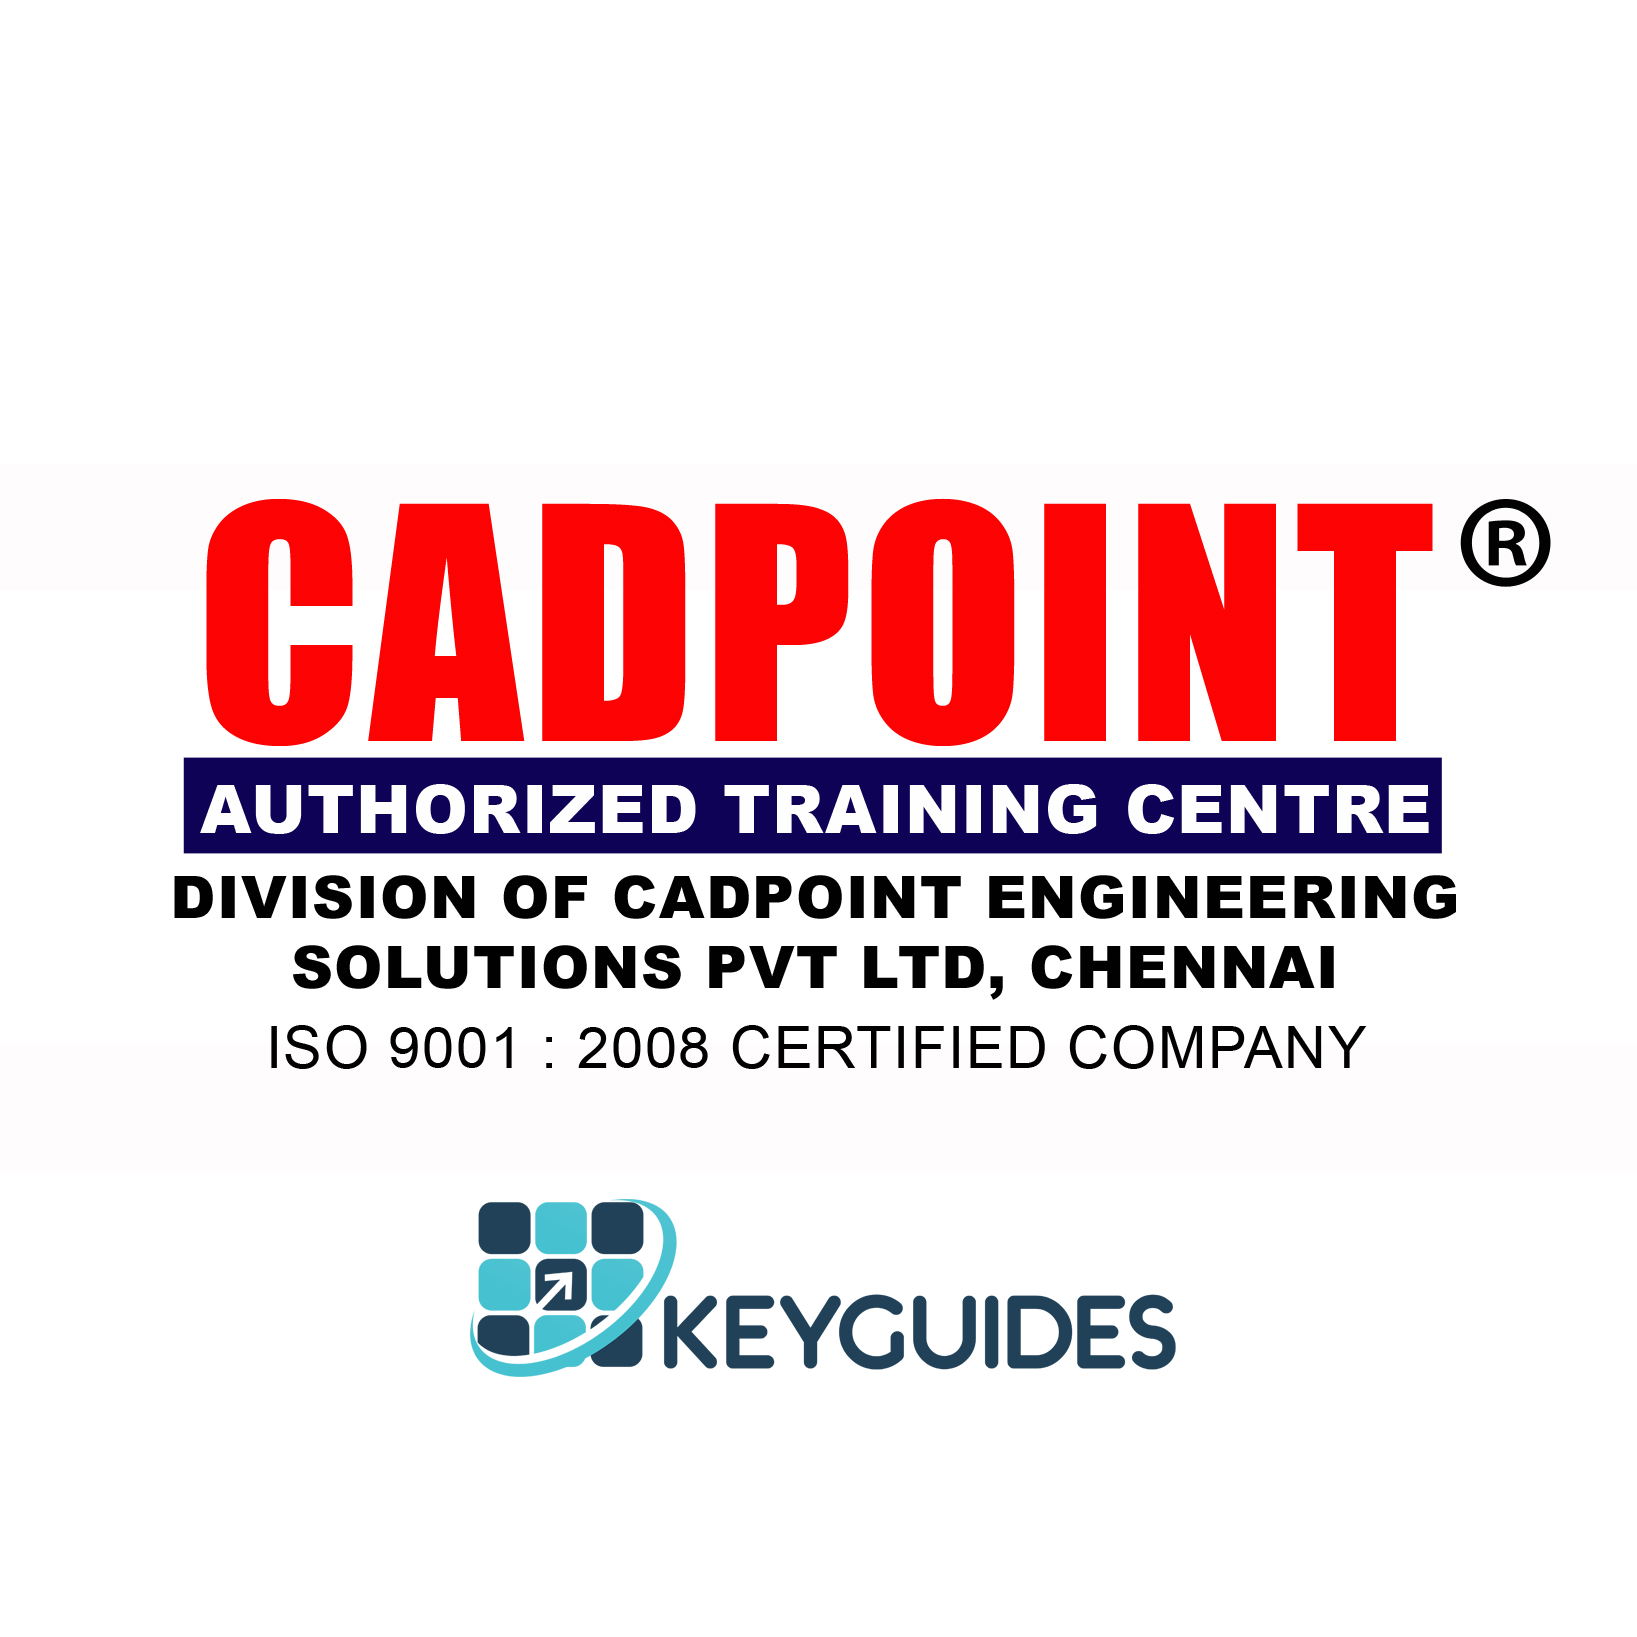 Civil Engineering Cadpoint Kochi